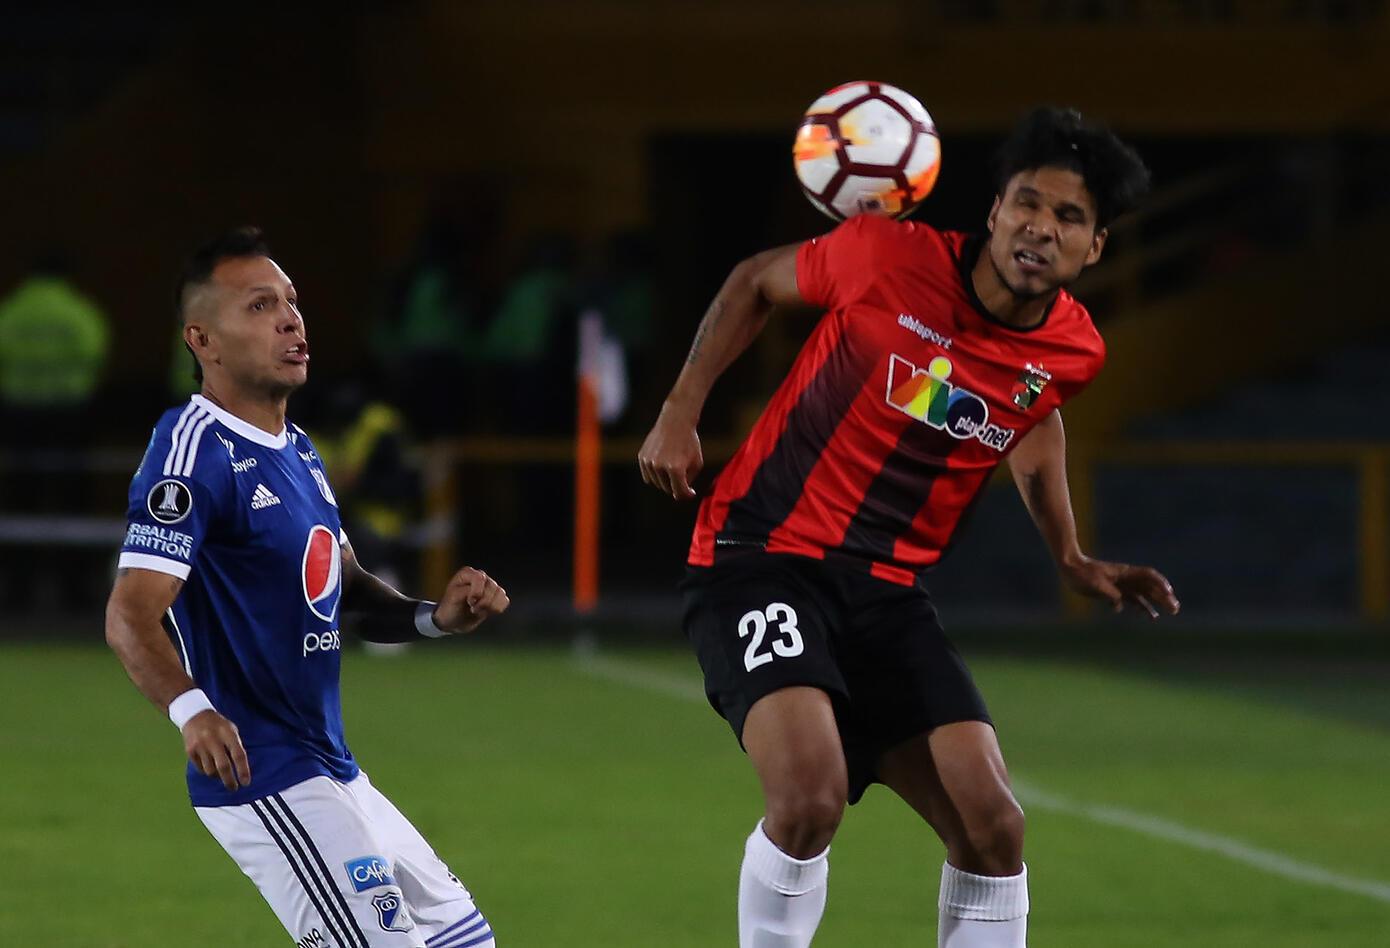 Millonarios - Deportivo Lara